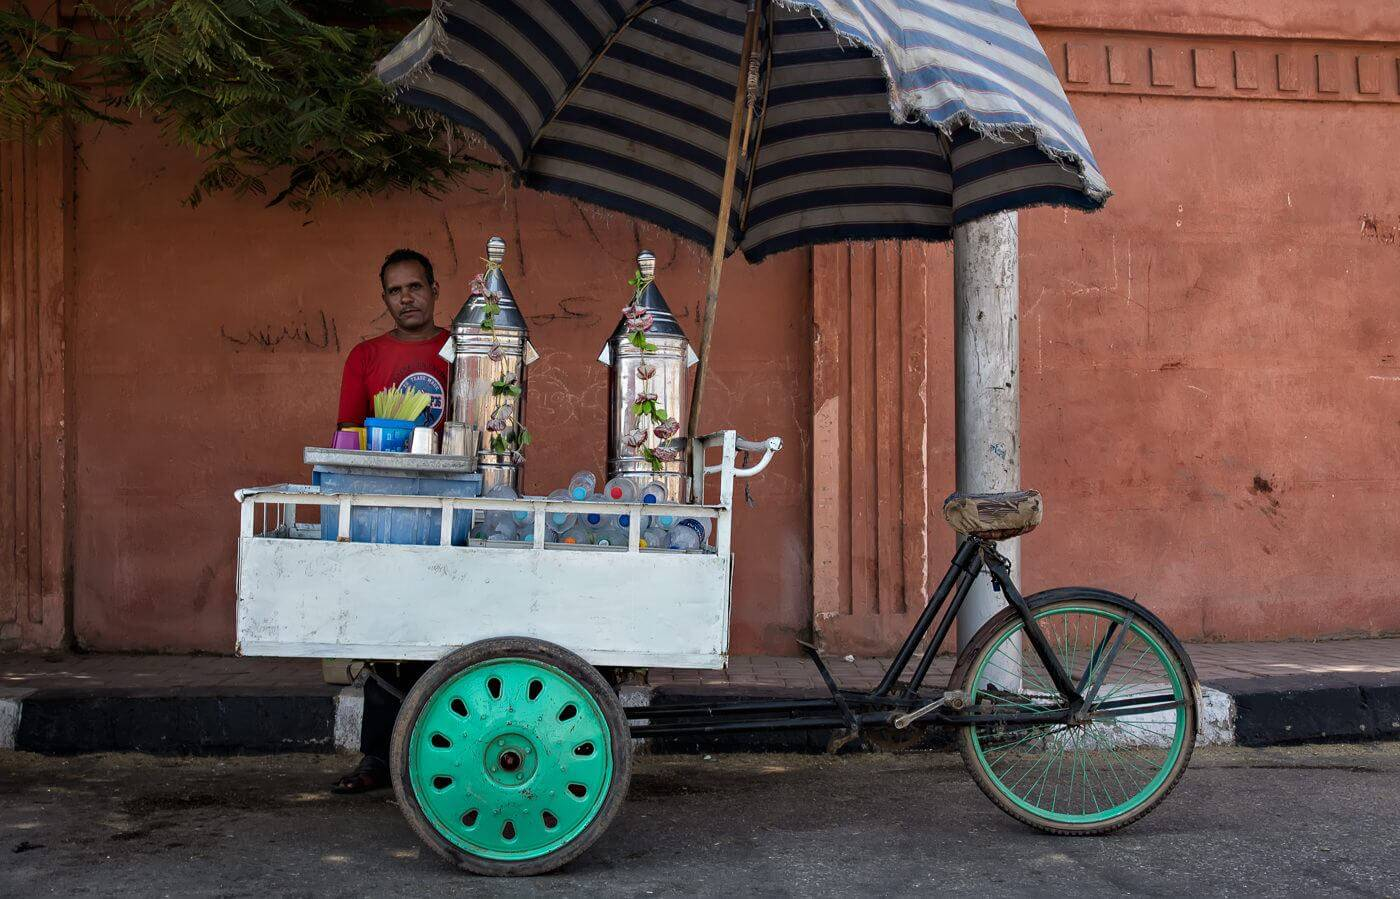 Street vendor of Karkade drink in Luxor, Egypt - Photo by Zdenek Sindelar of CuriousZed Photography